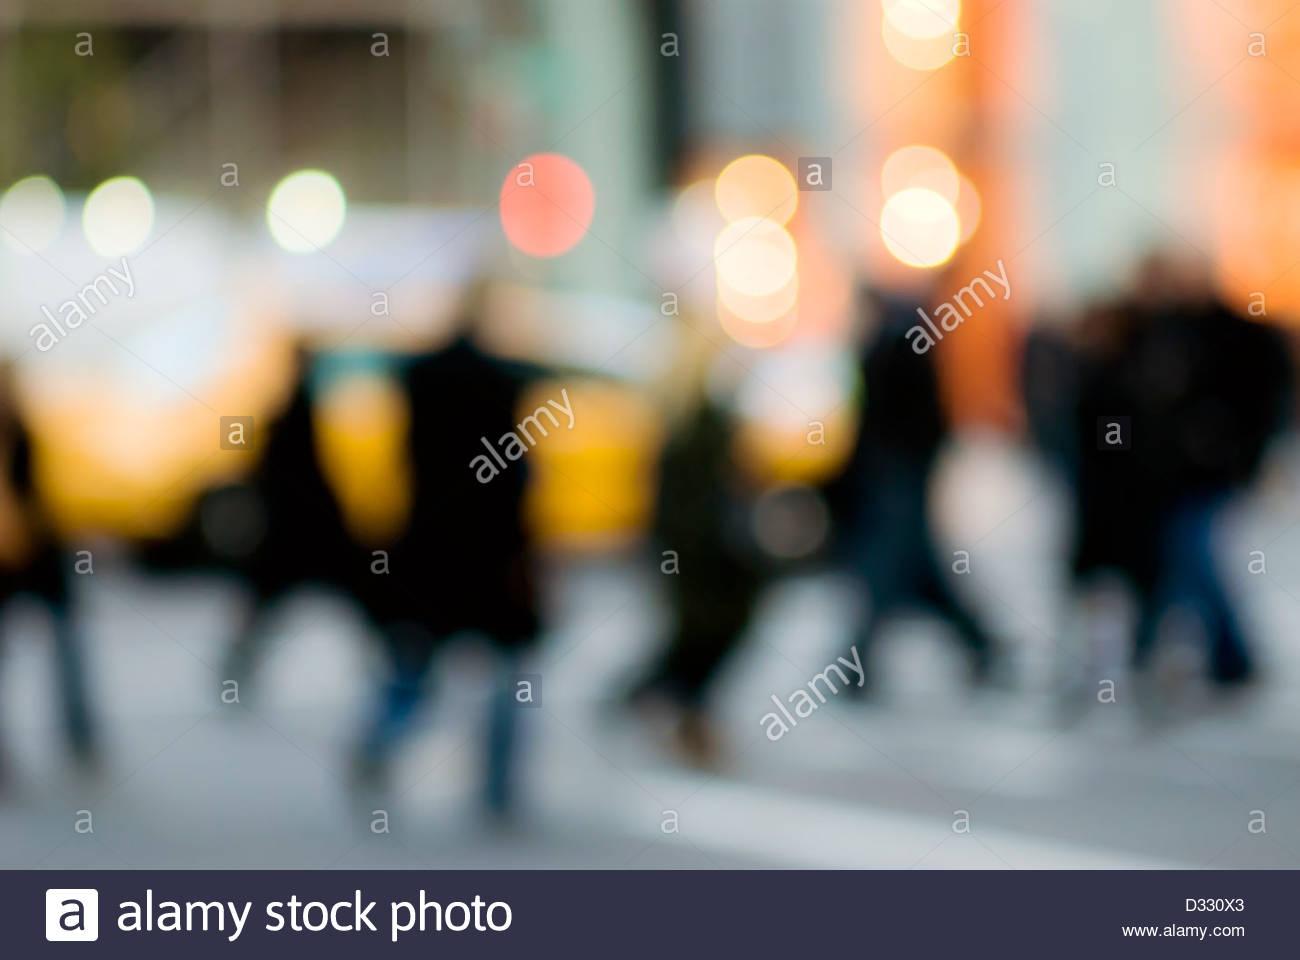 Abstrakte urban Straßenszene mit Menschenmenge, New York City. Stockbild